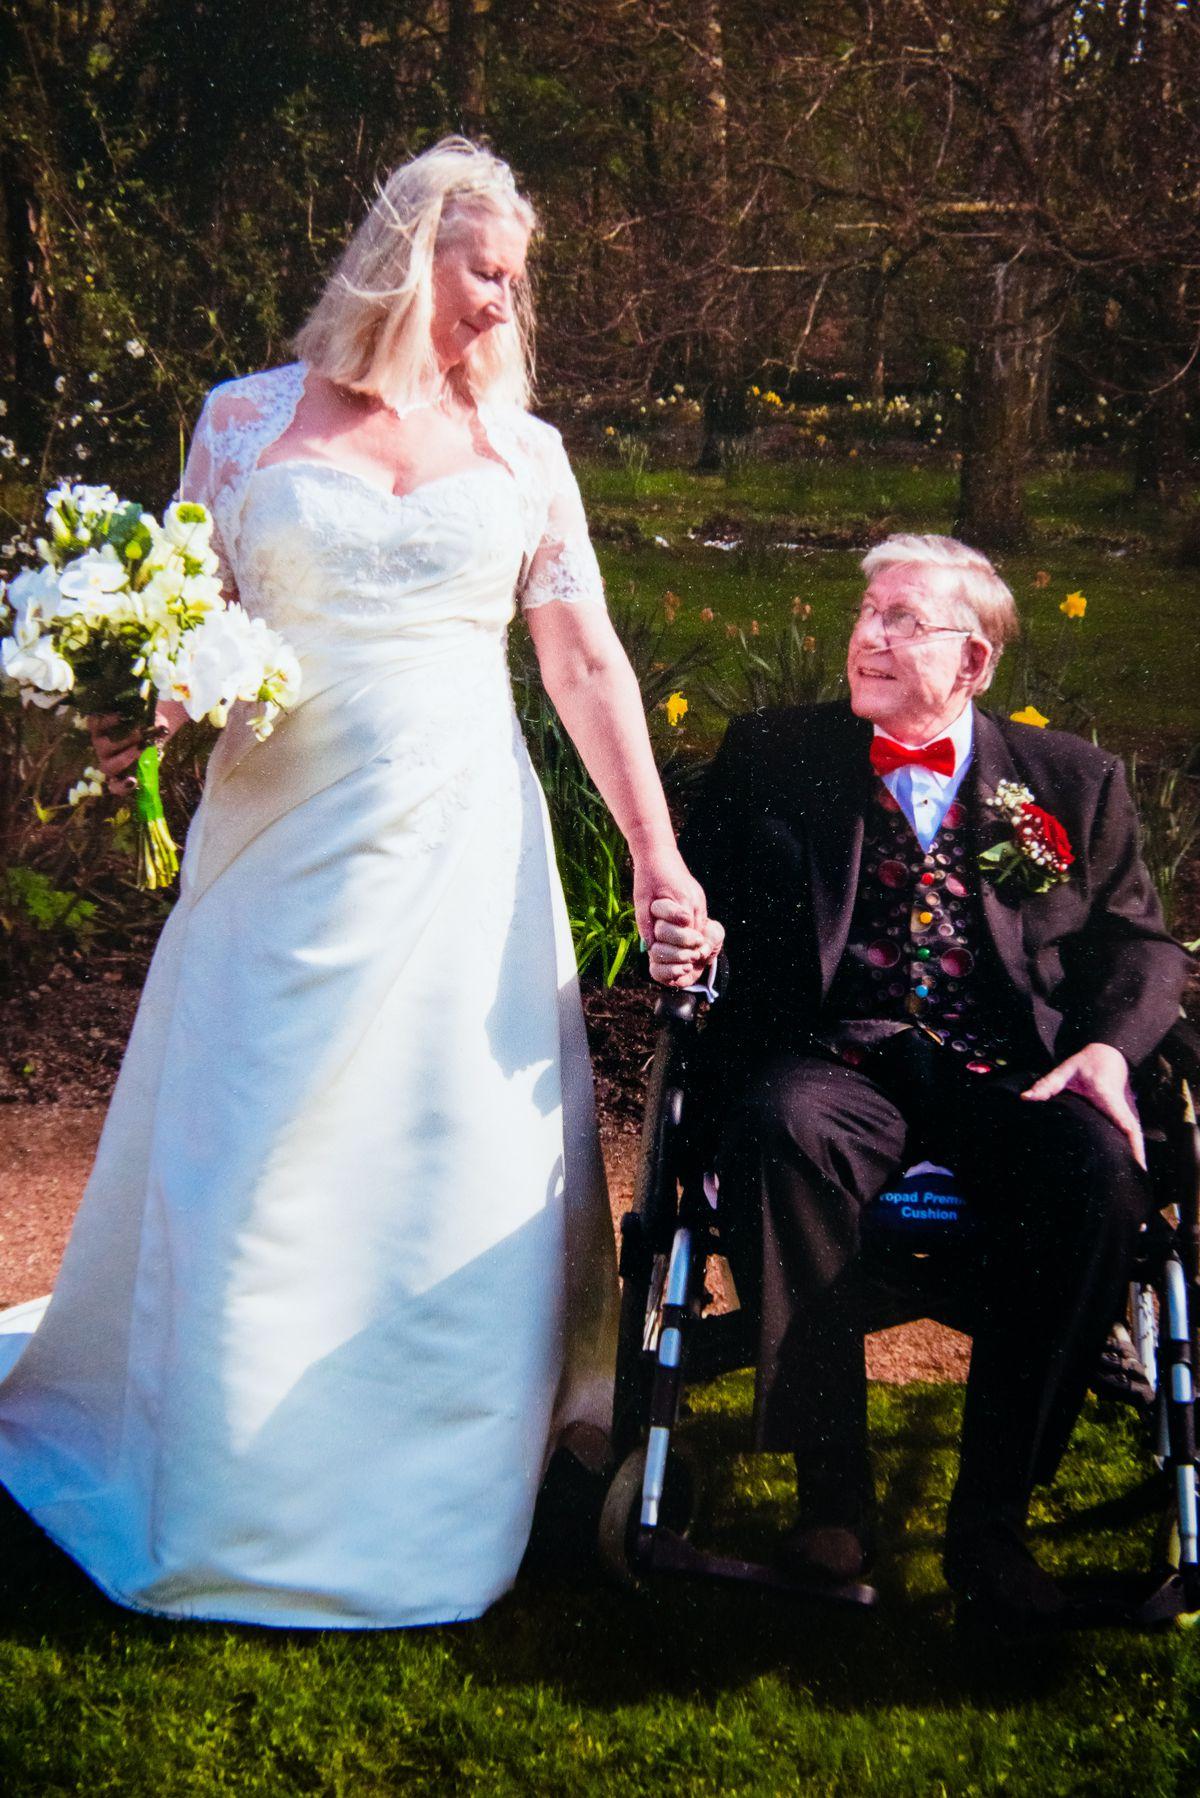 John and Irene Bradbury on their wedding day